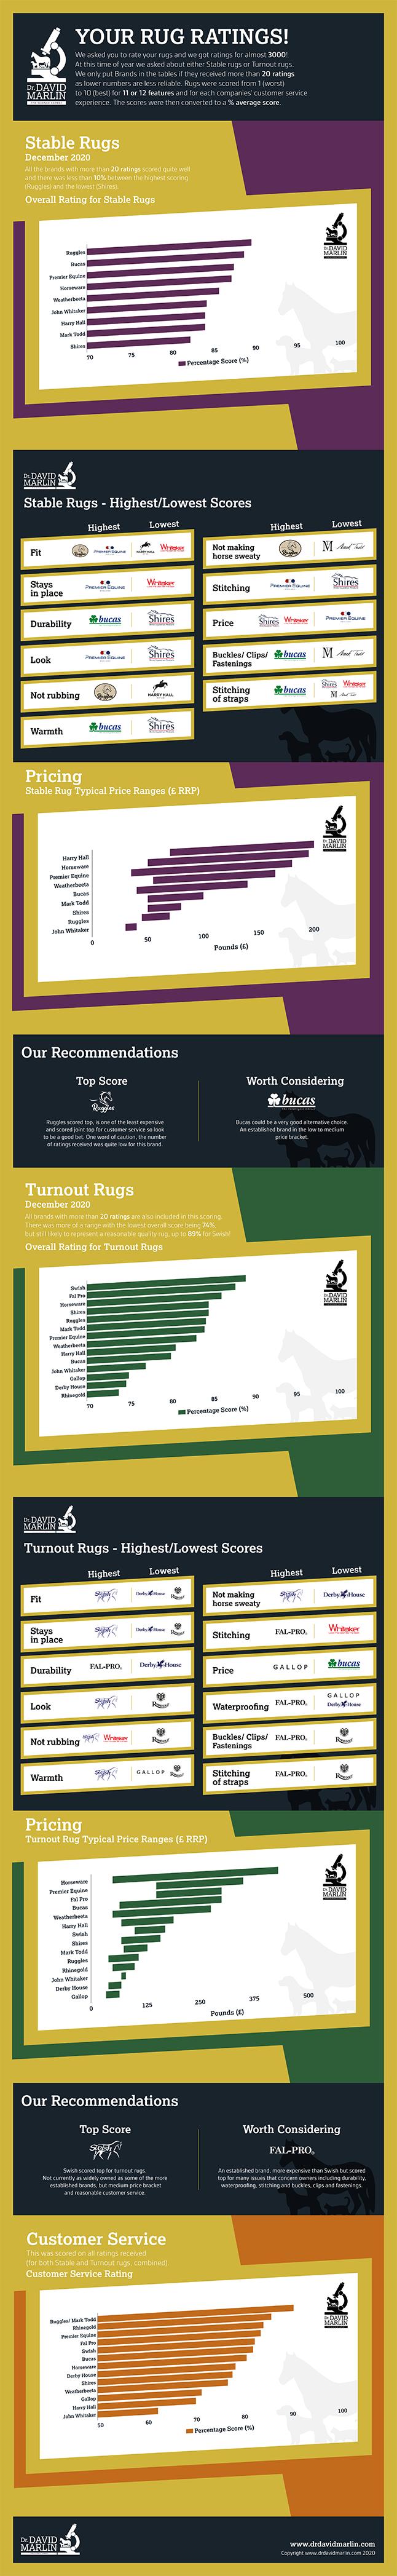 Rug Survey Results